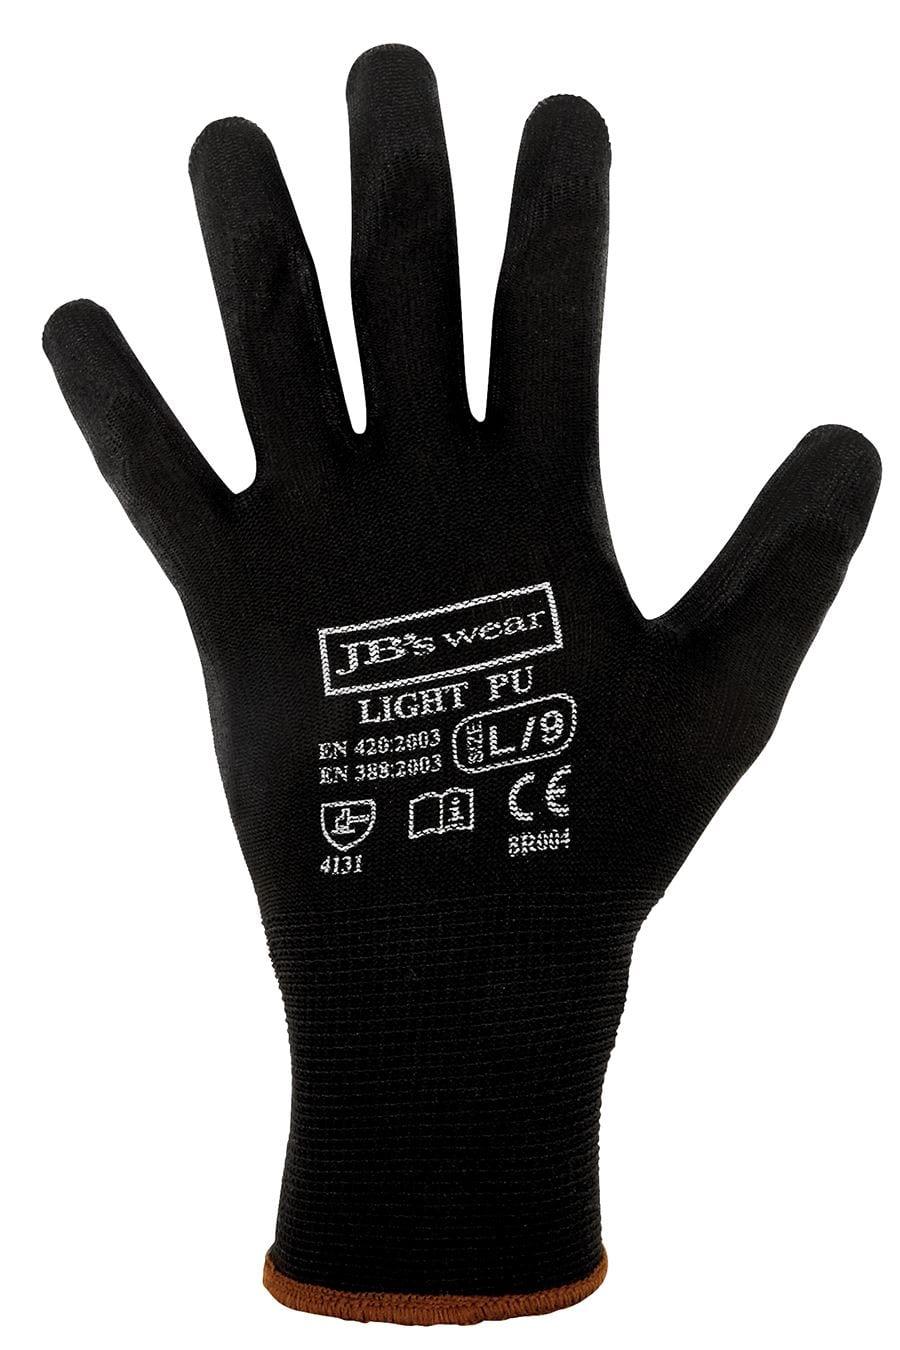 8R004 Black Light PU Breathable Glove